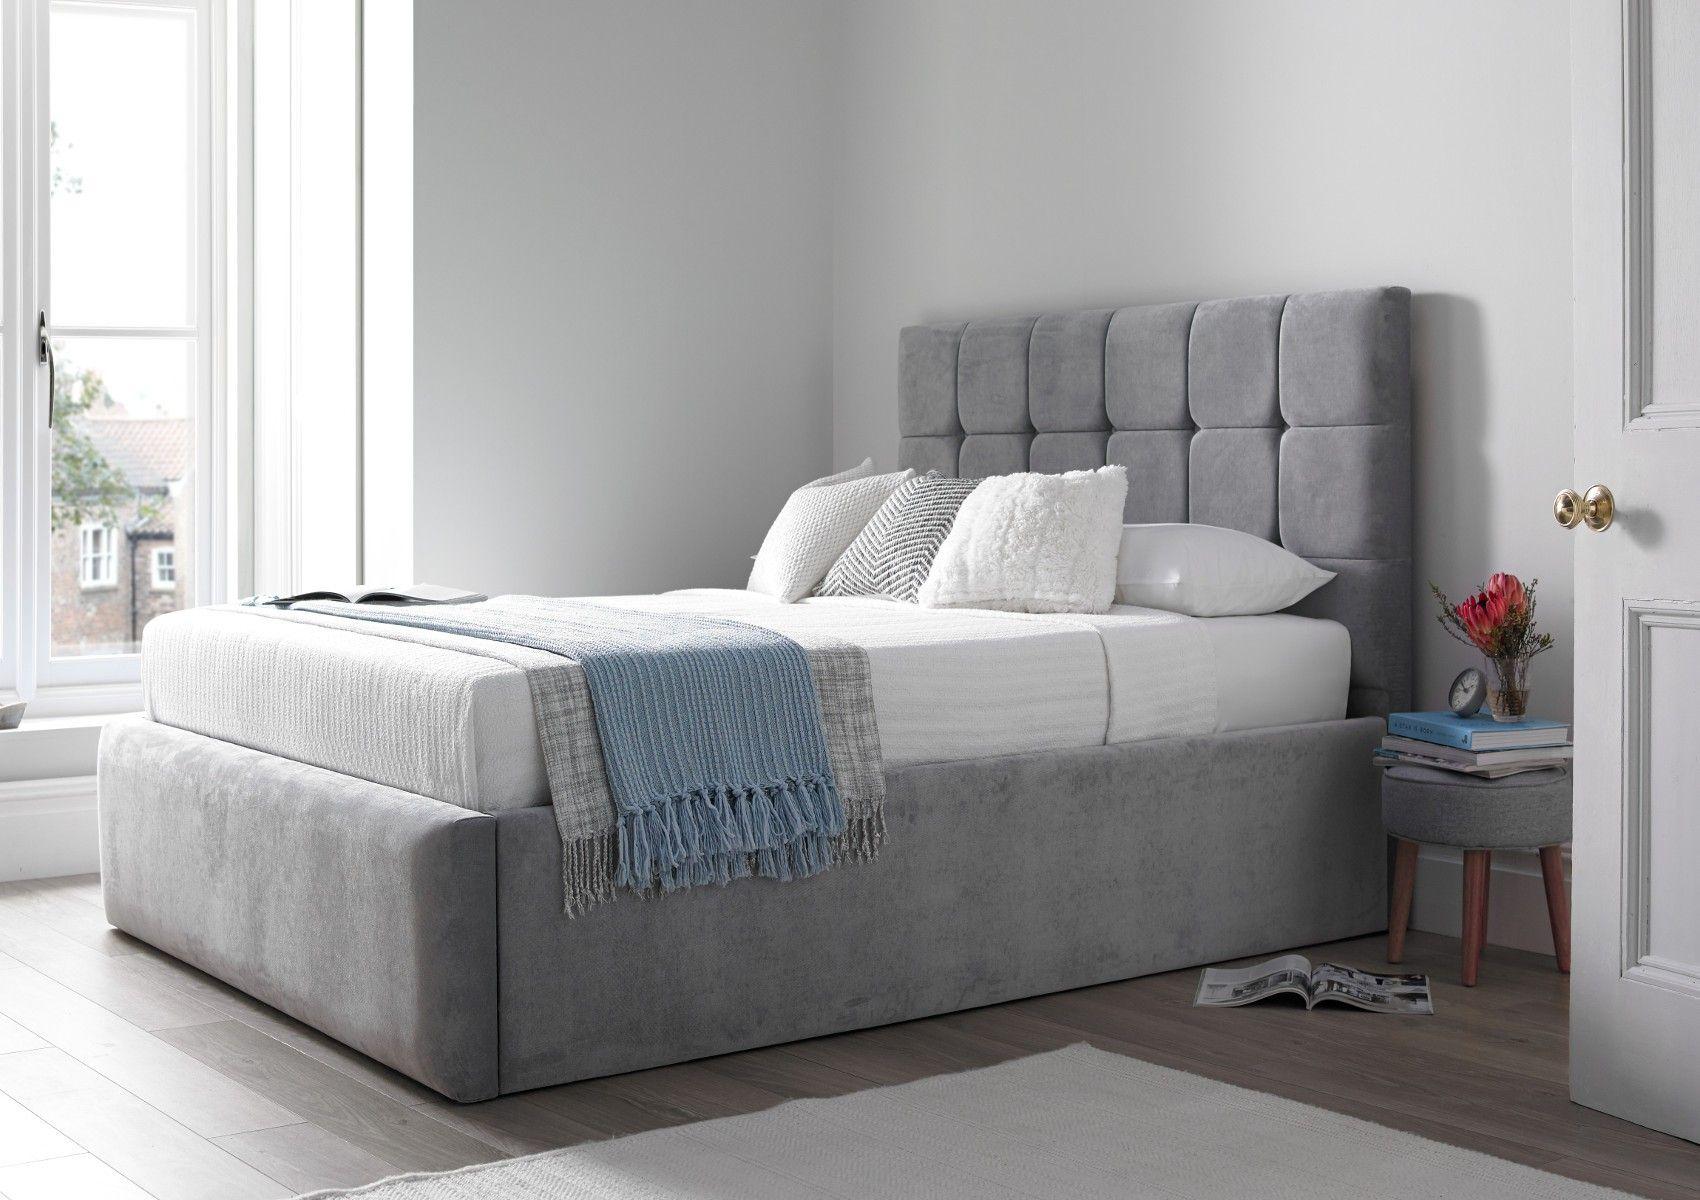 bromley upholstered ottoman bed frame storage beds beds